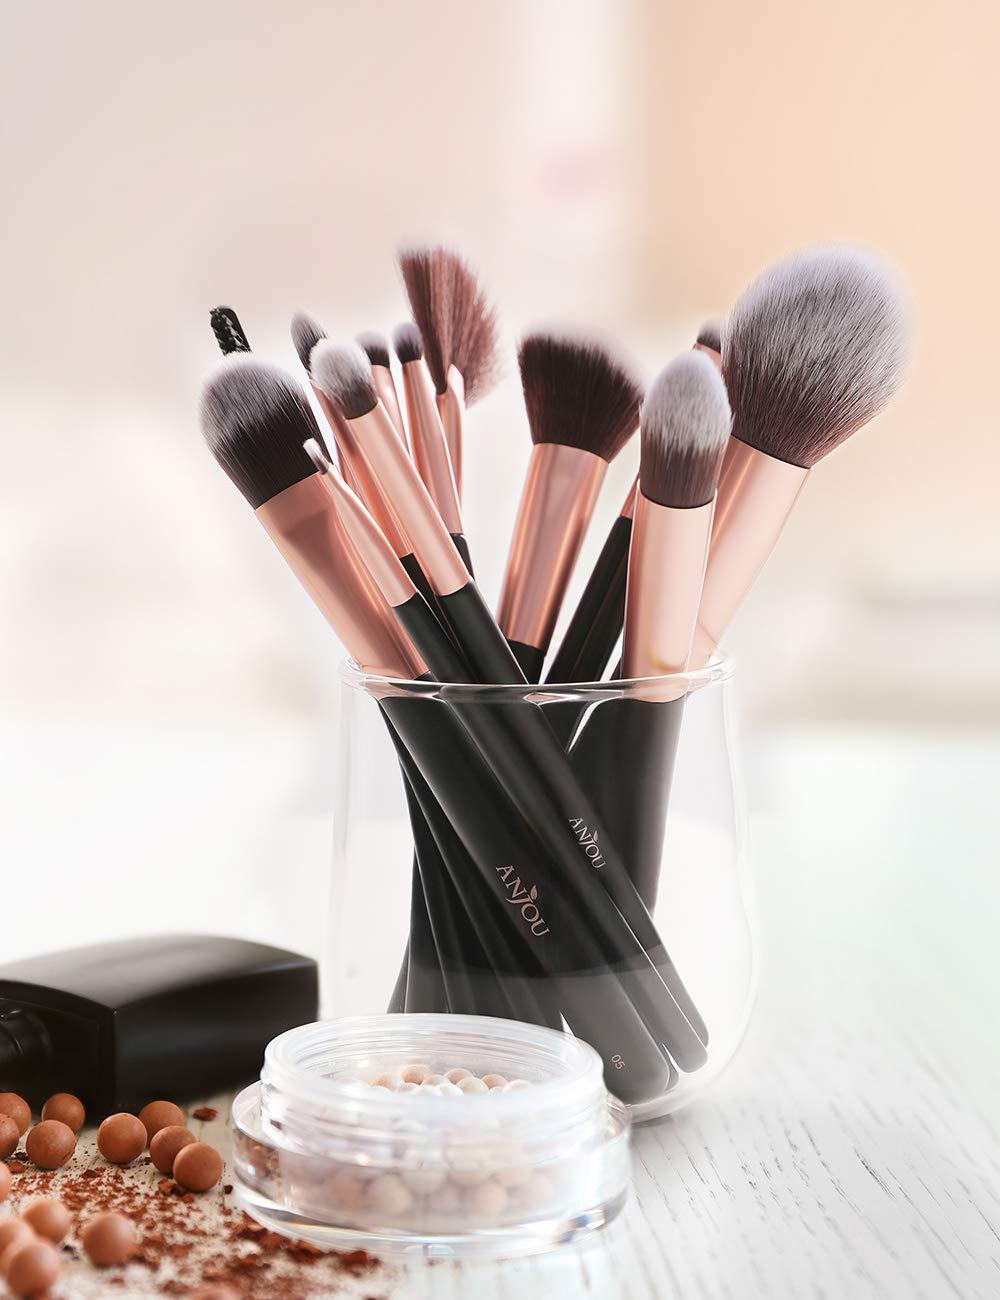 Anjou Makeup Brush Set 24 Pcs Premium Professional Kabuki Foundation Face Powder Blush Eyeshadow